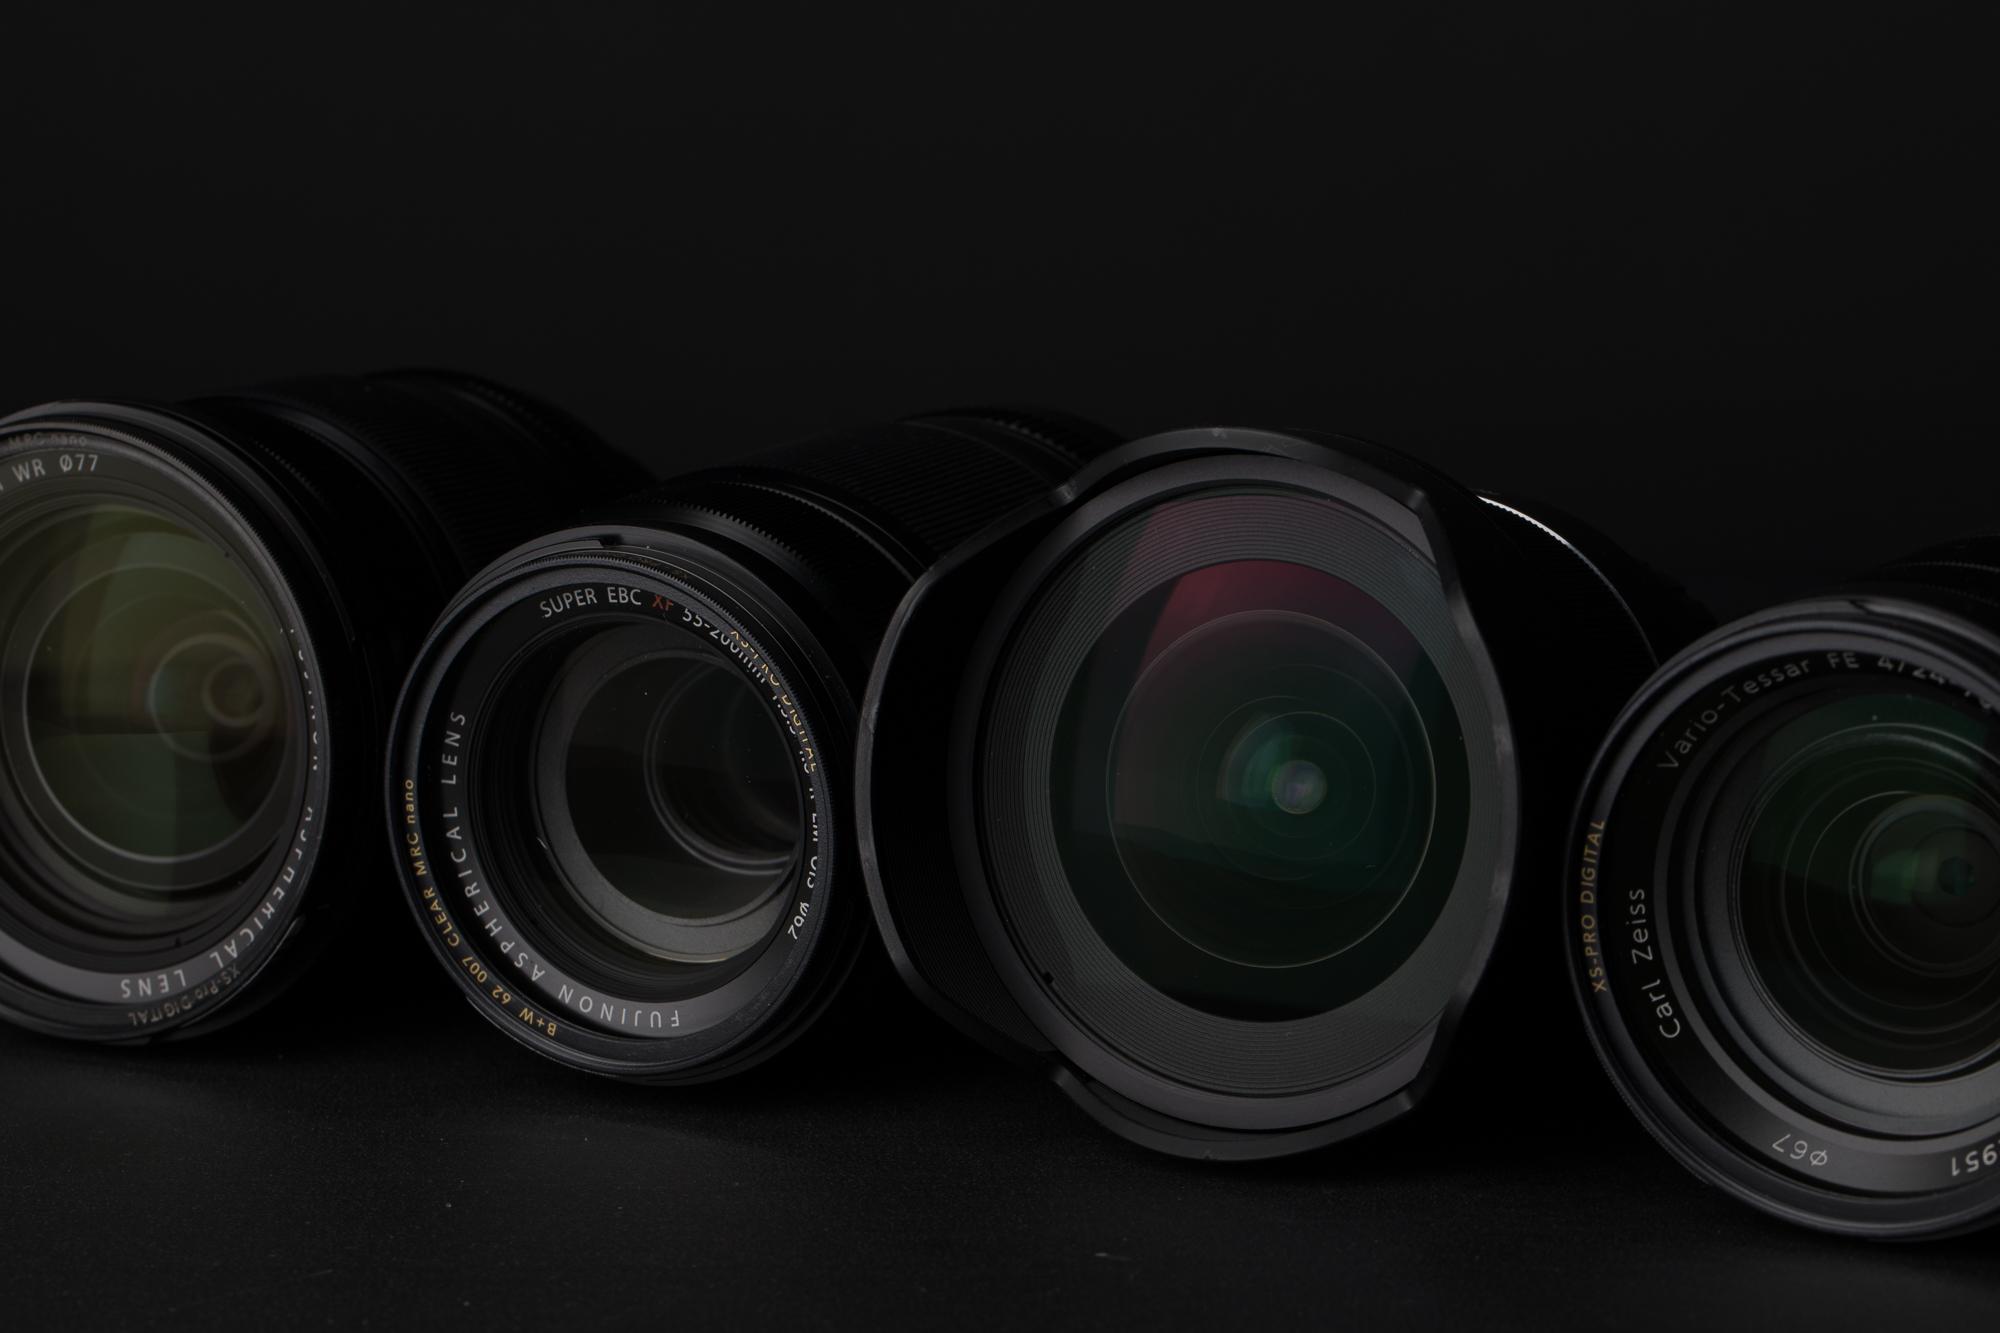 Stopping down Lens